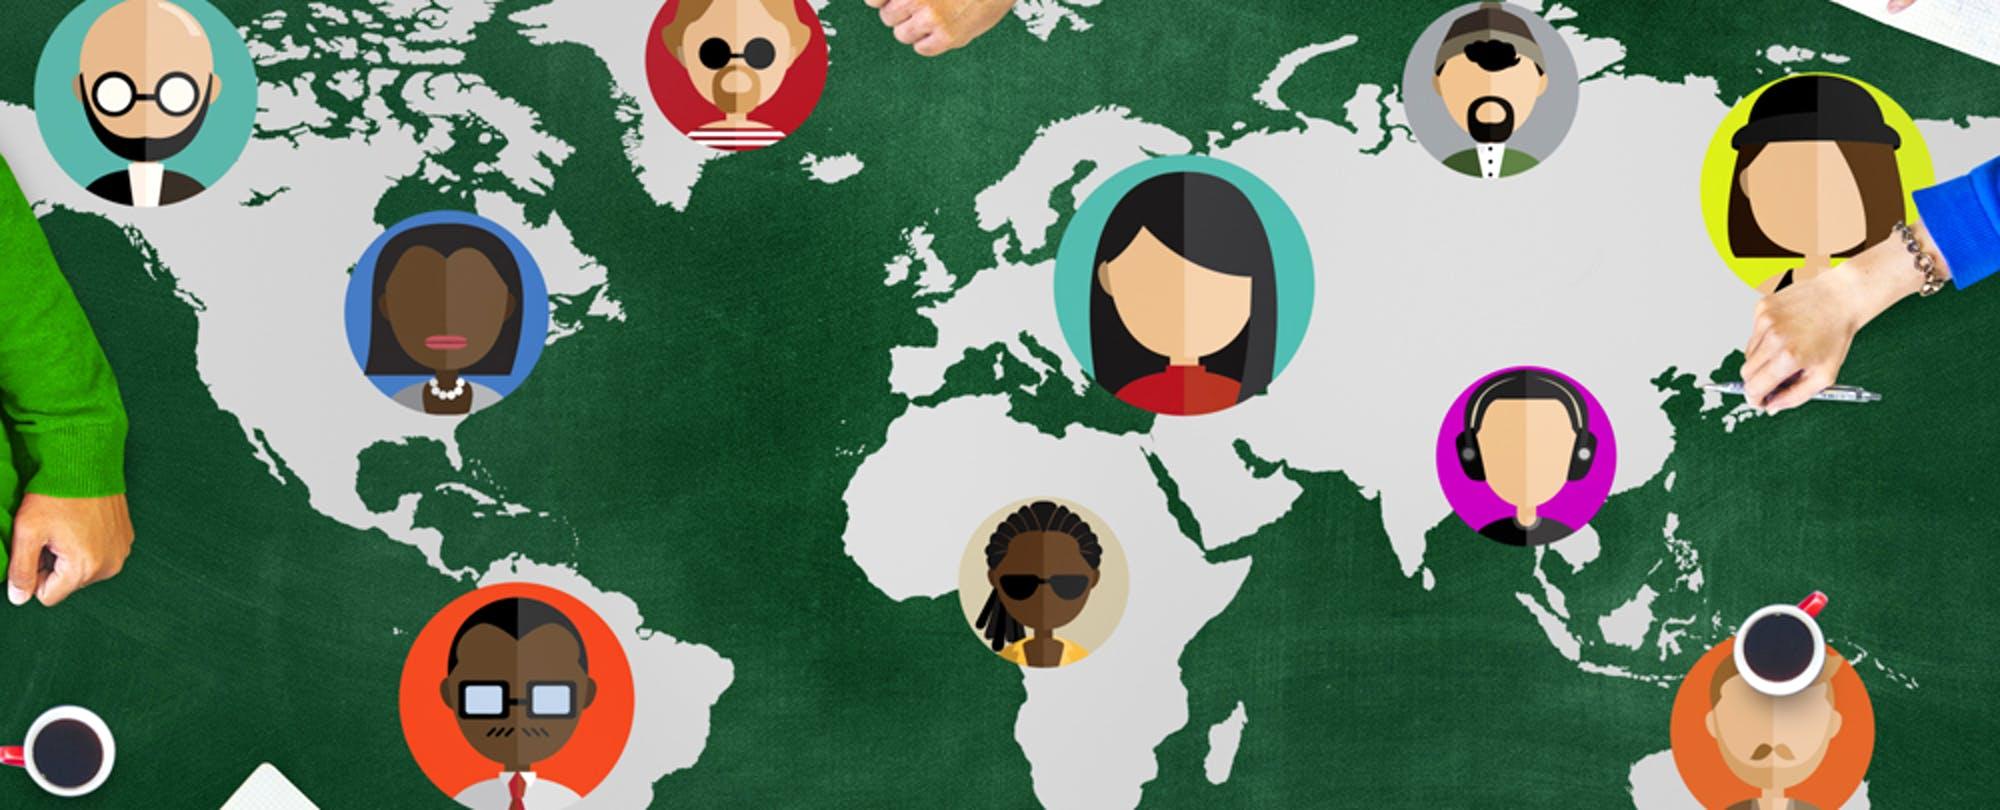 How Open edX Plans to Reach 1 Billion Learners